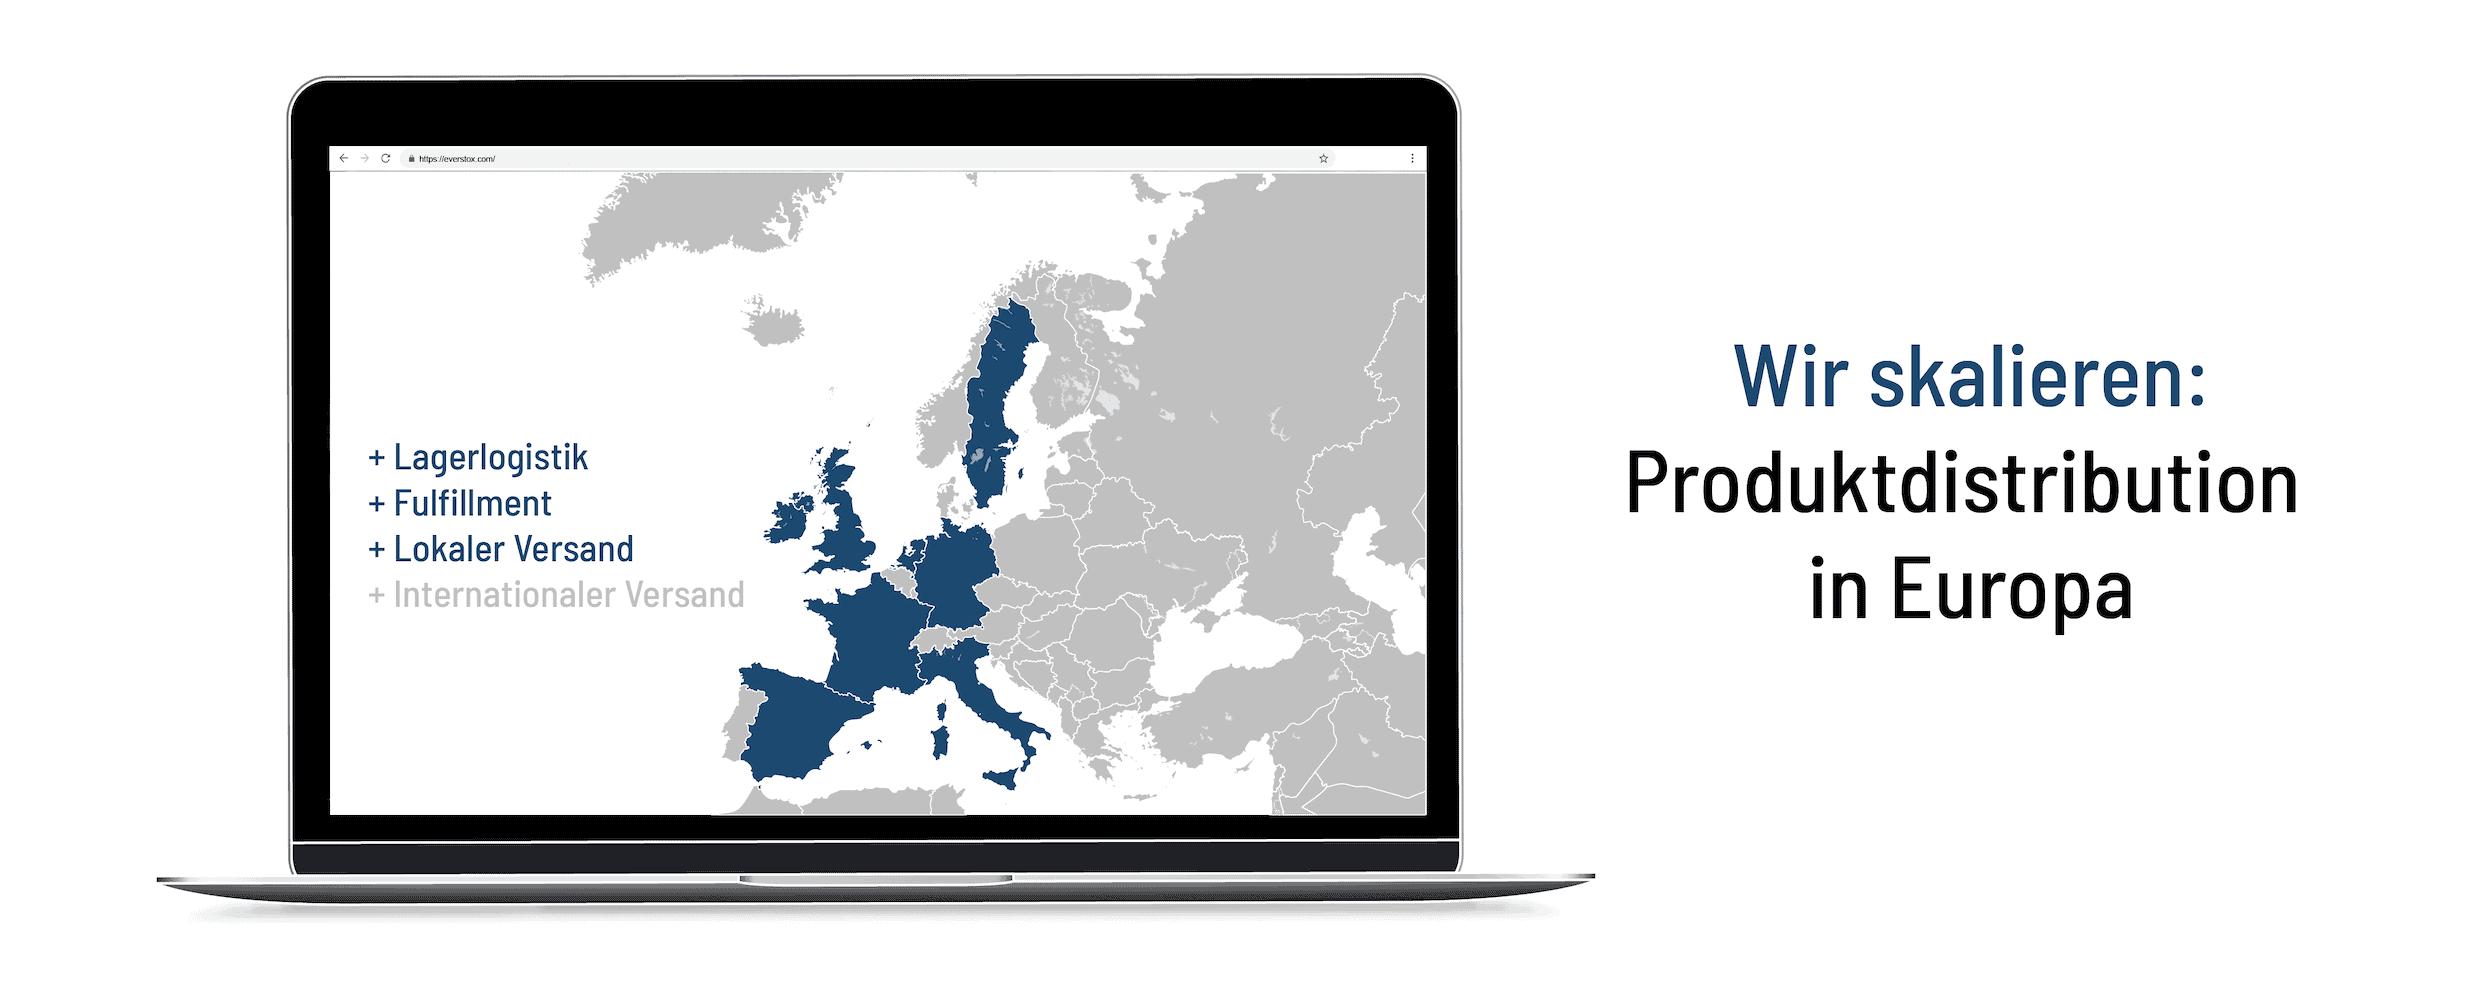 everstox Produktdistribution Europa